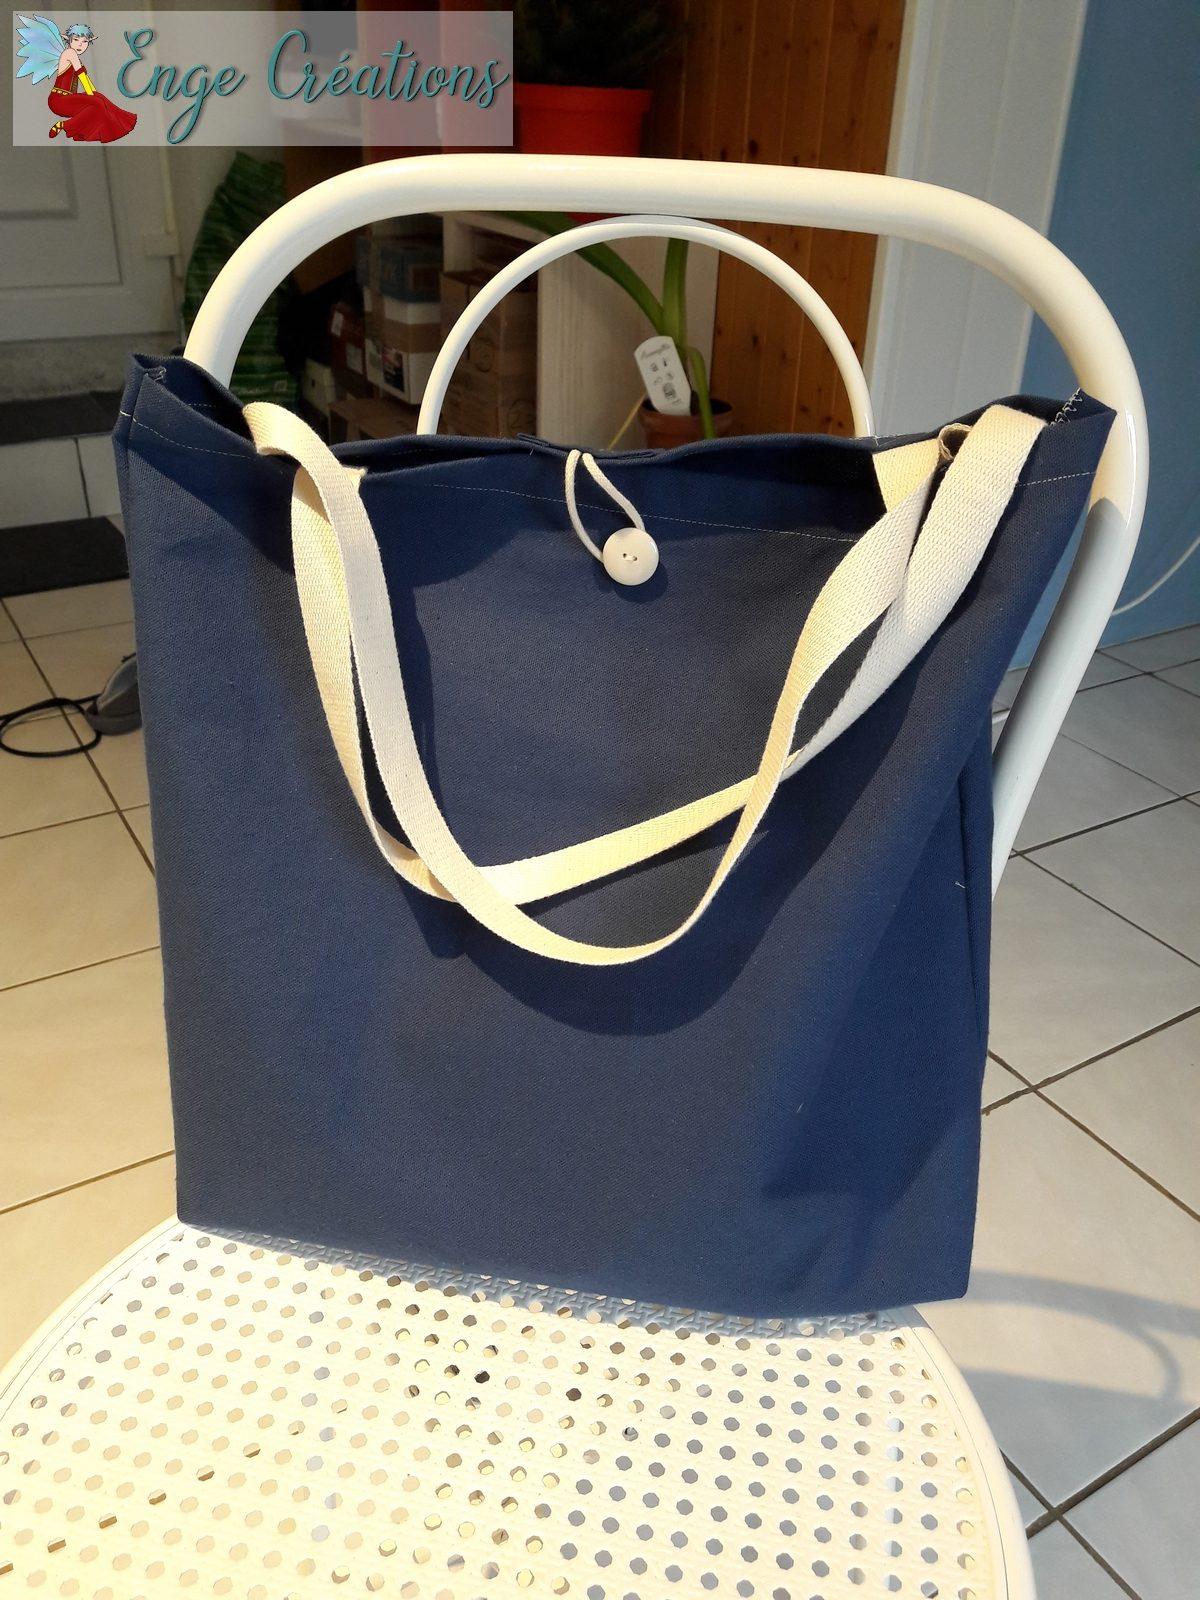 Mapi's Tote Bags